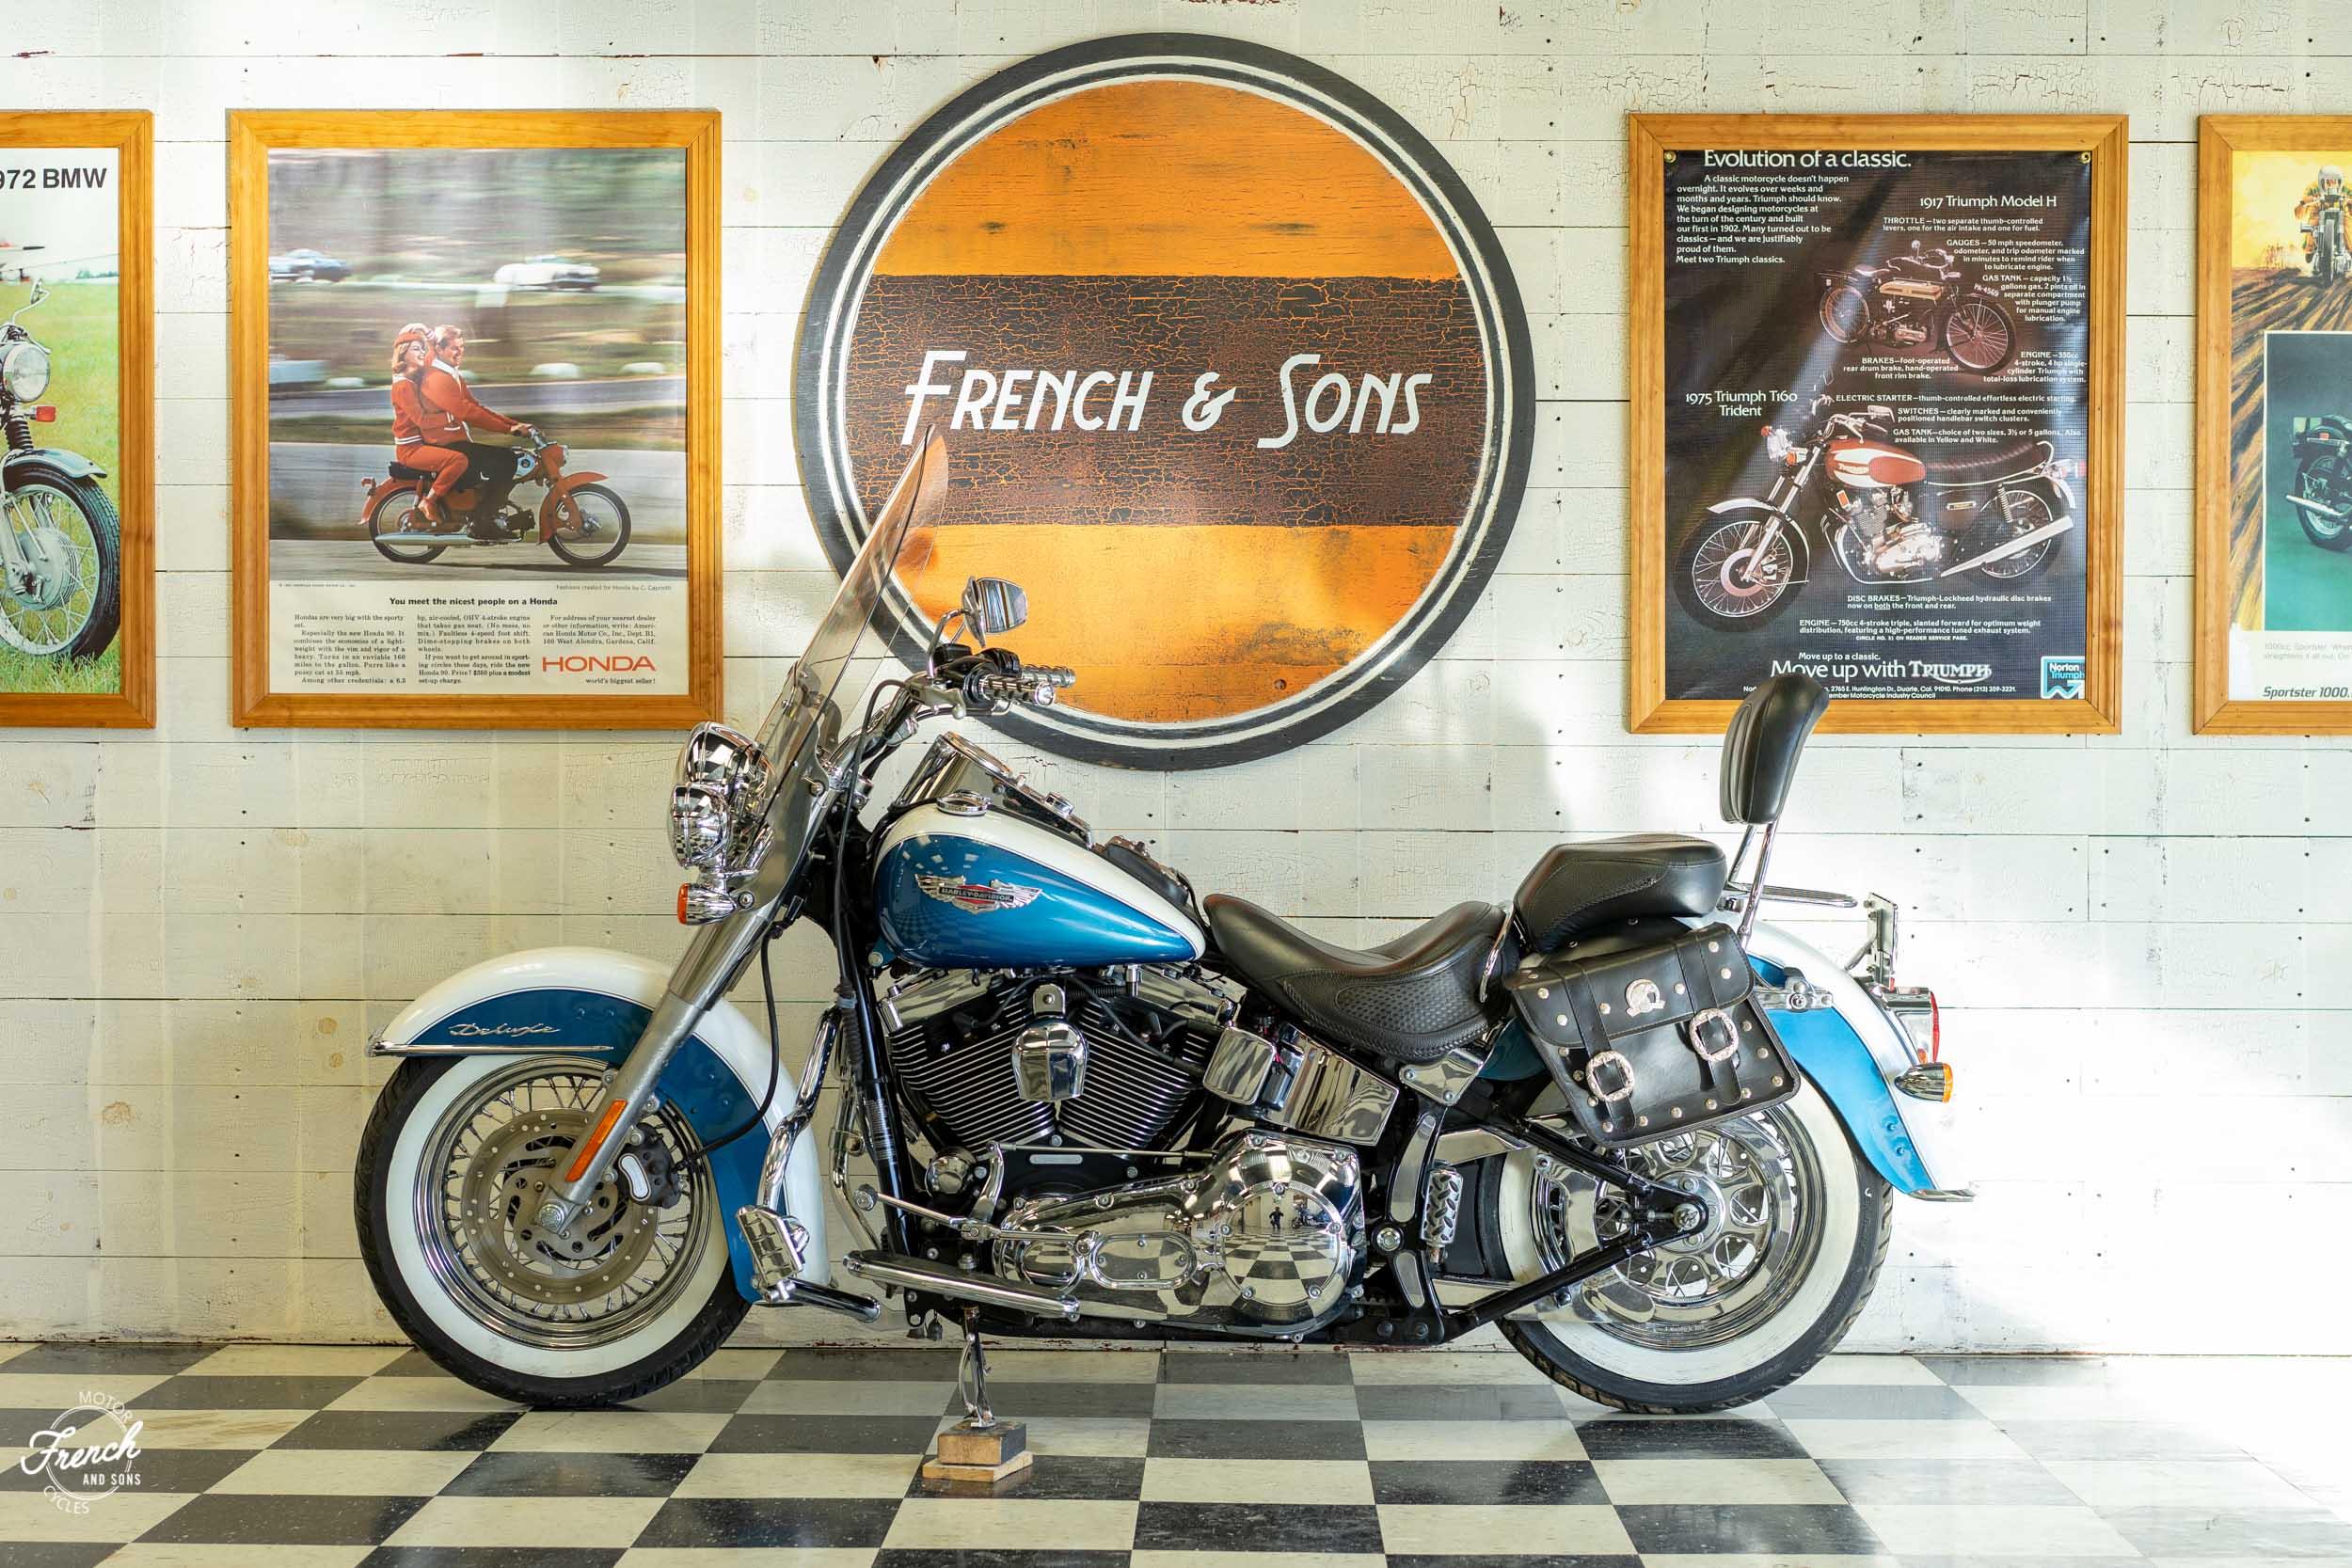 2005_Harley_Davidson_Softail_Deluxe-14.jpg